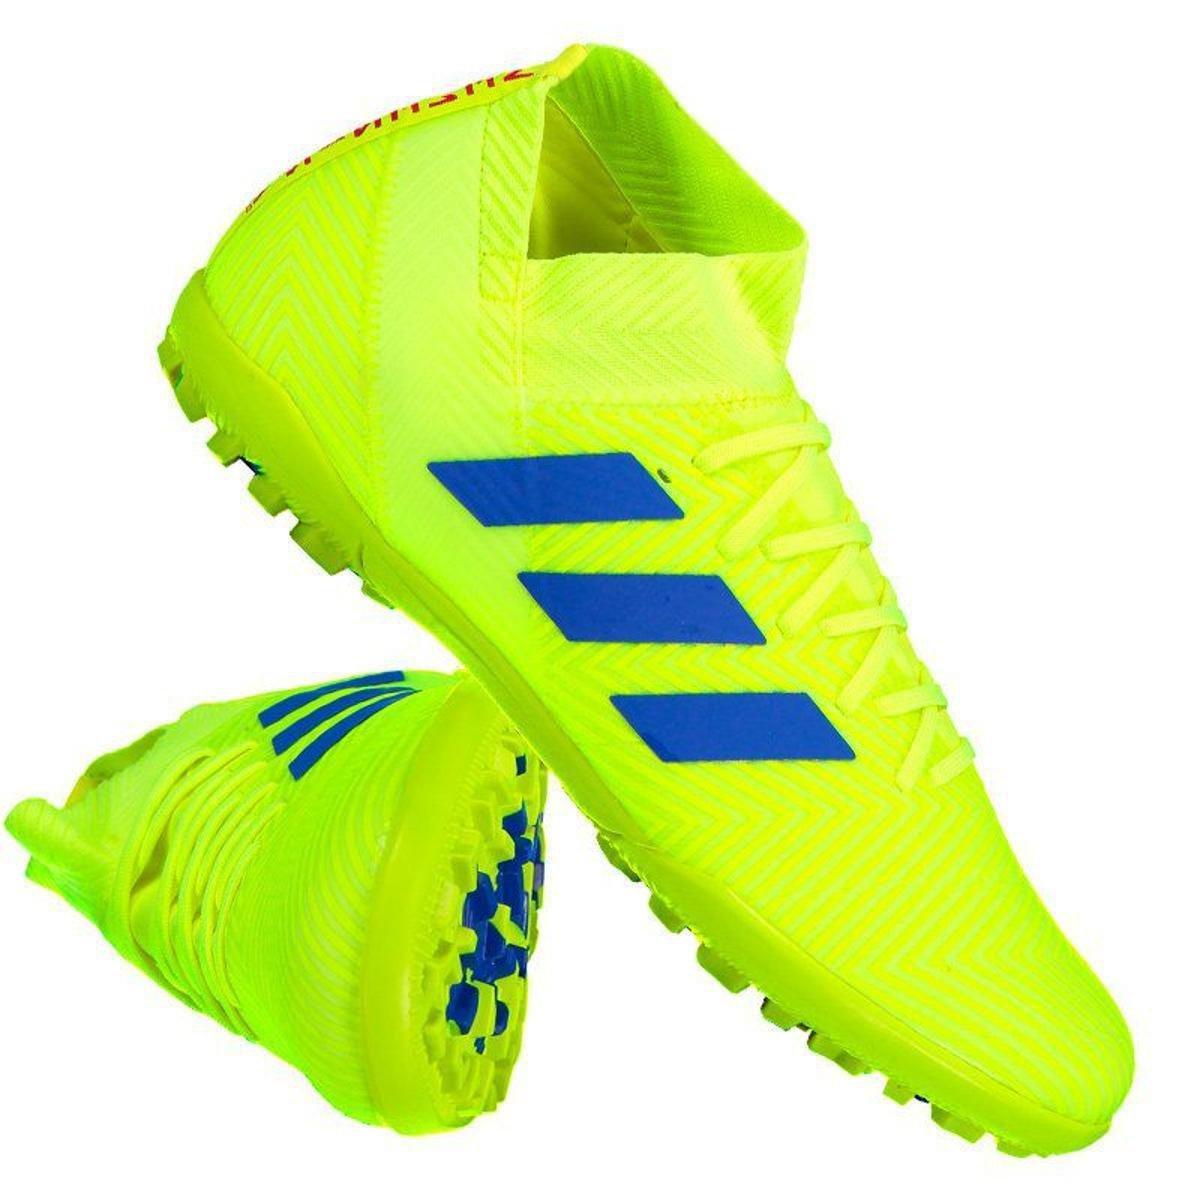 FornecedorNetshoes. Chuteira Society Adidas Nemeziz 18 3 TF dab1bf06fcc43